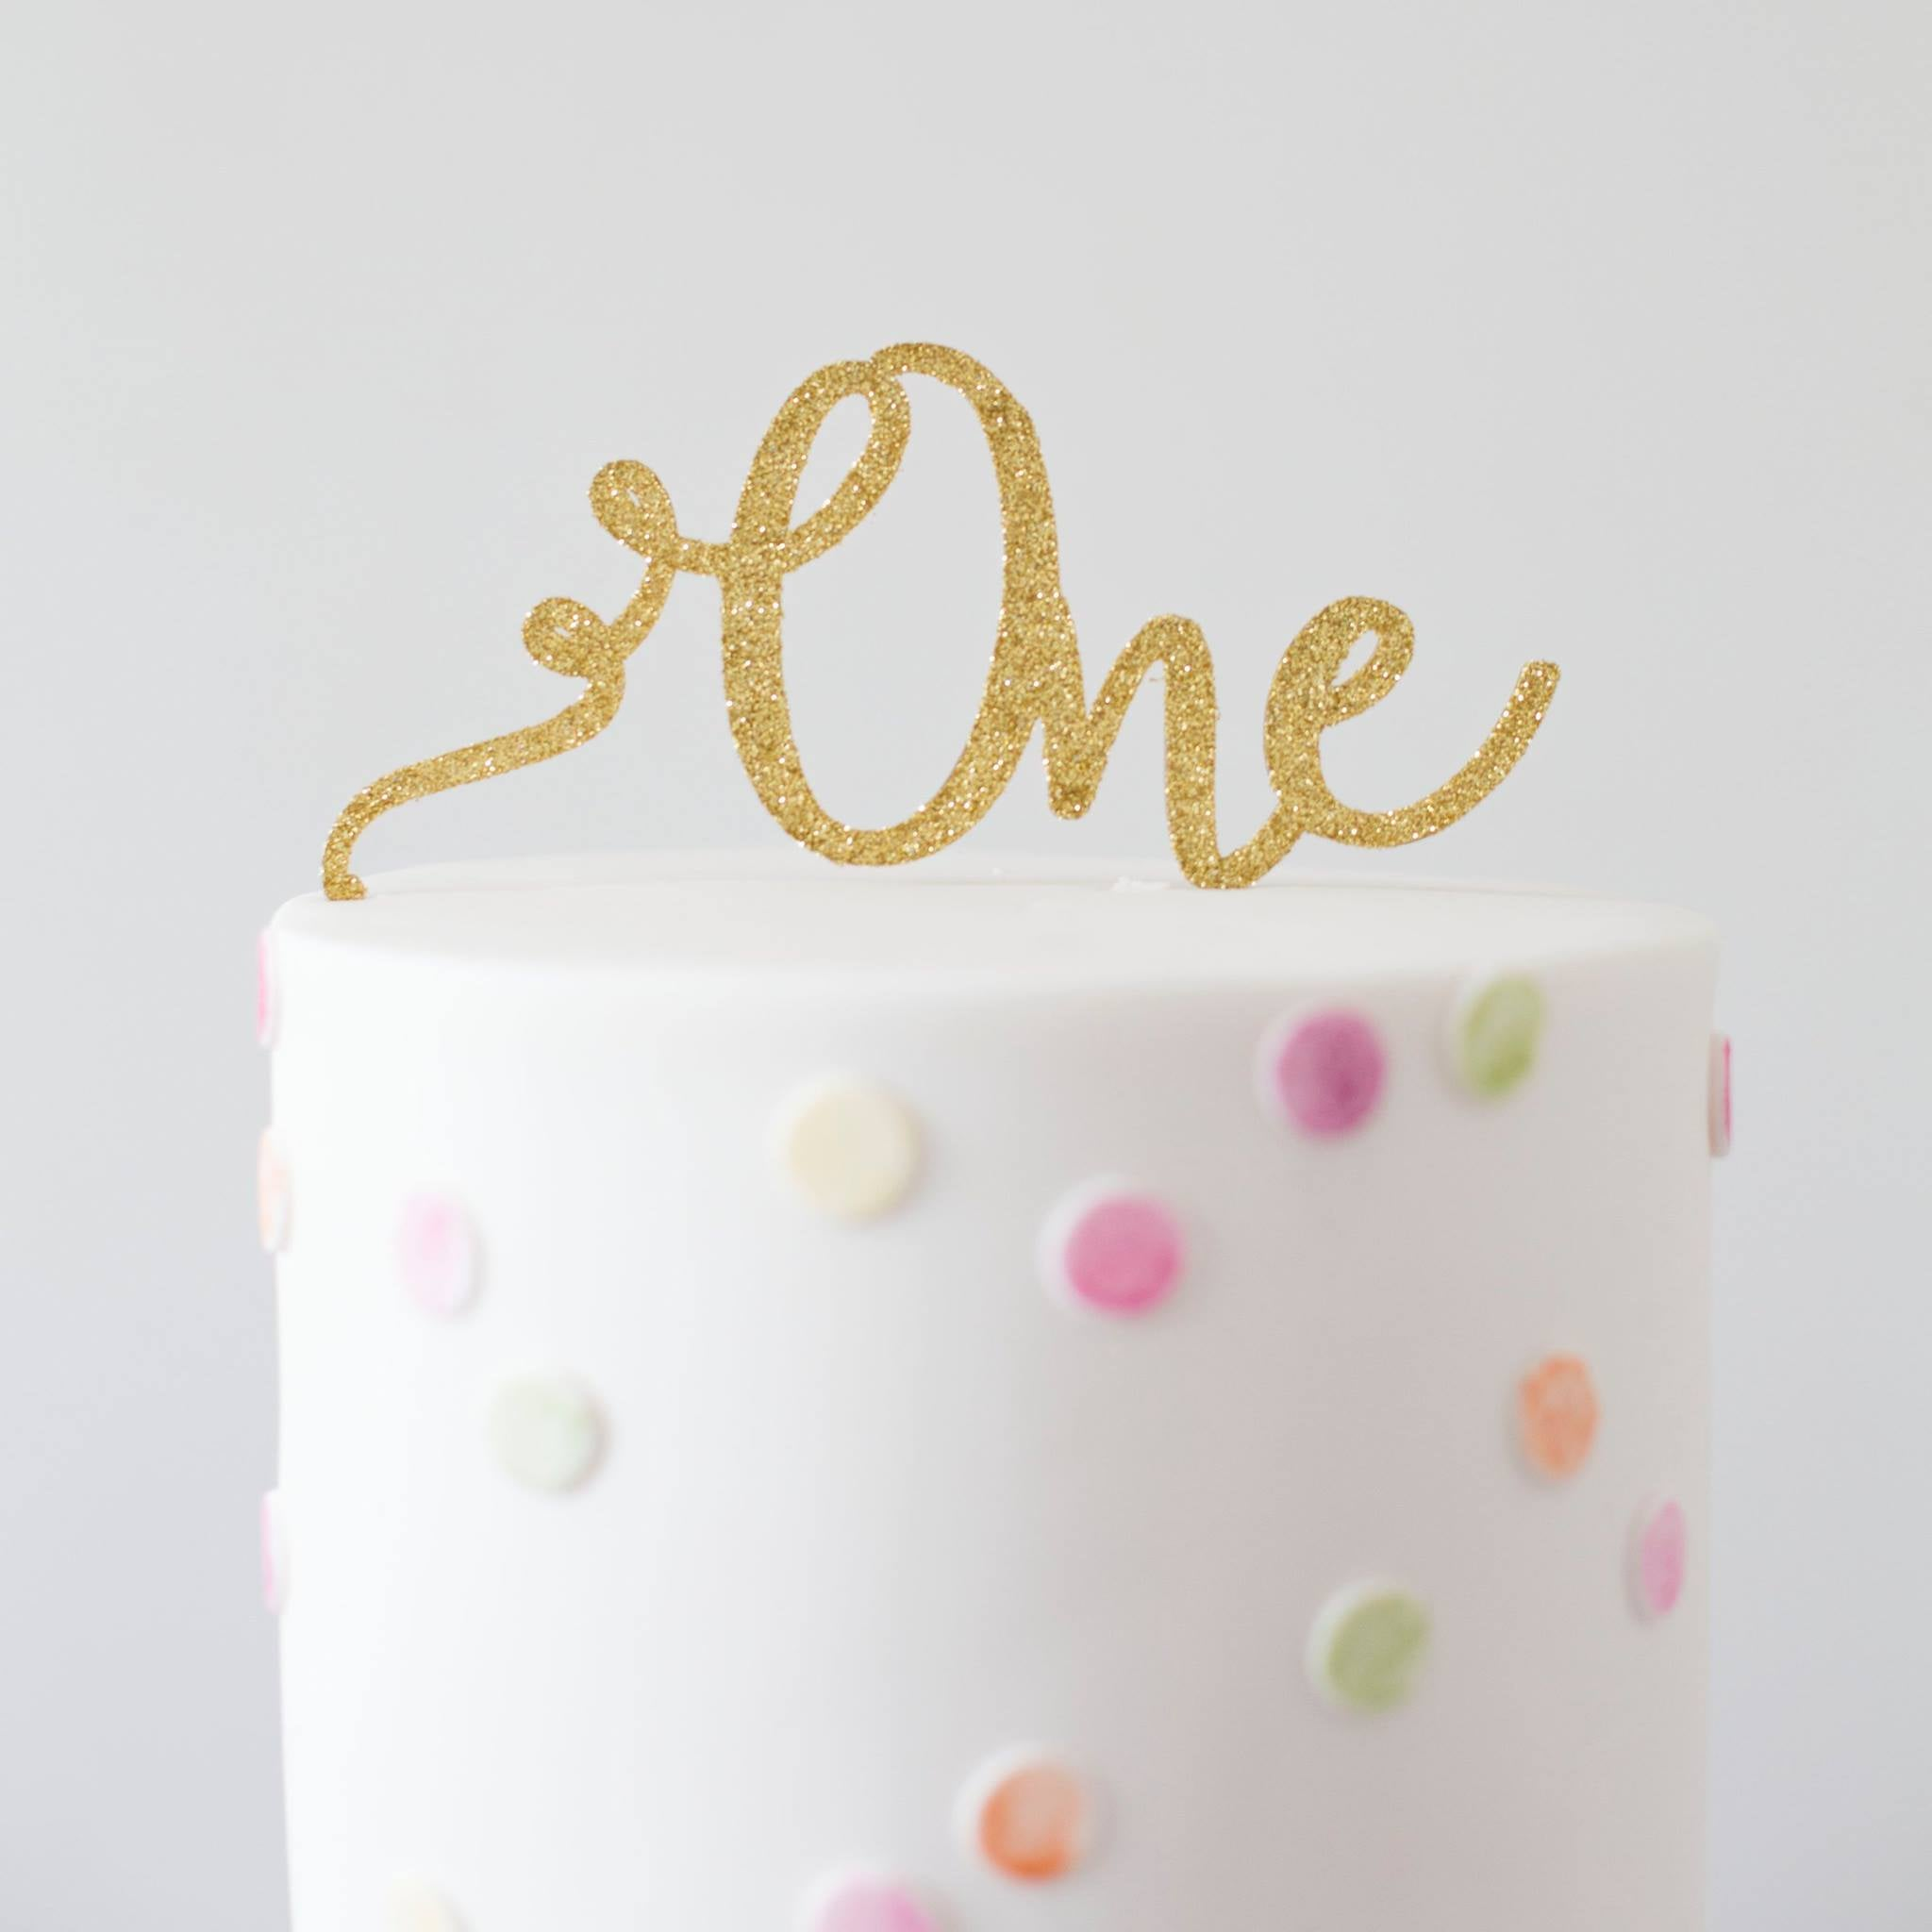 Glistening Occasions Swirl One Cake Topper